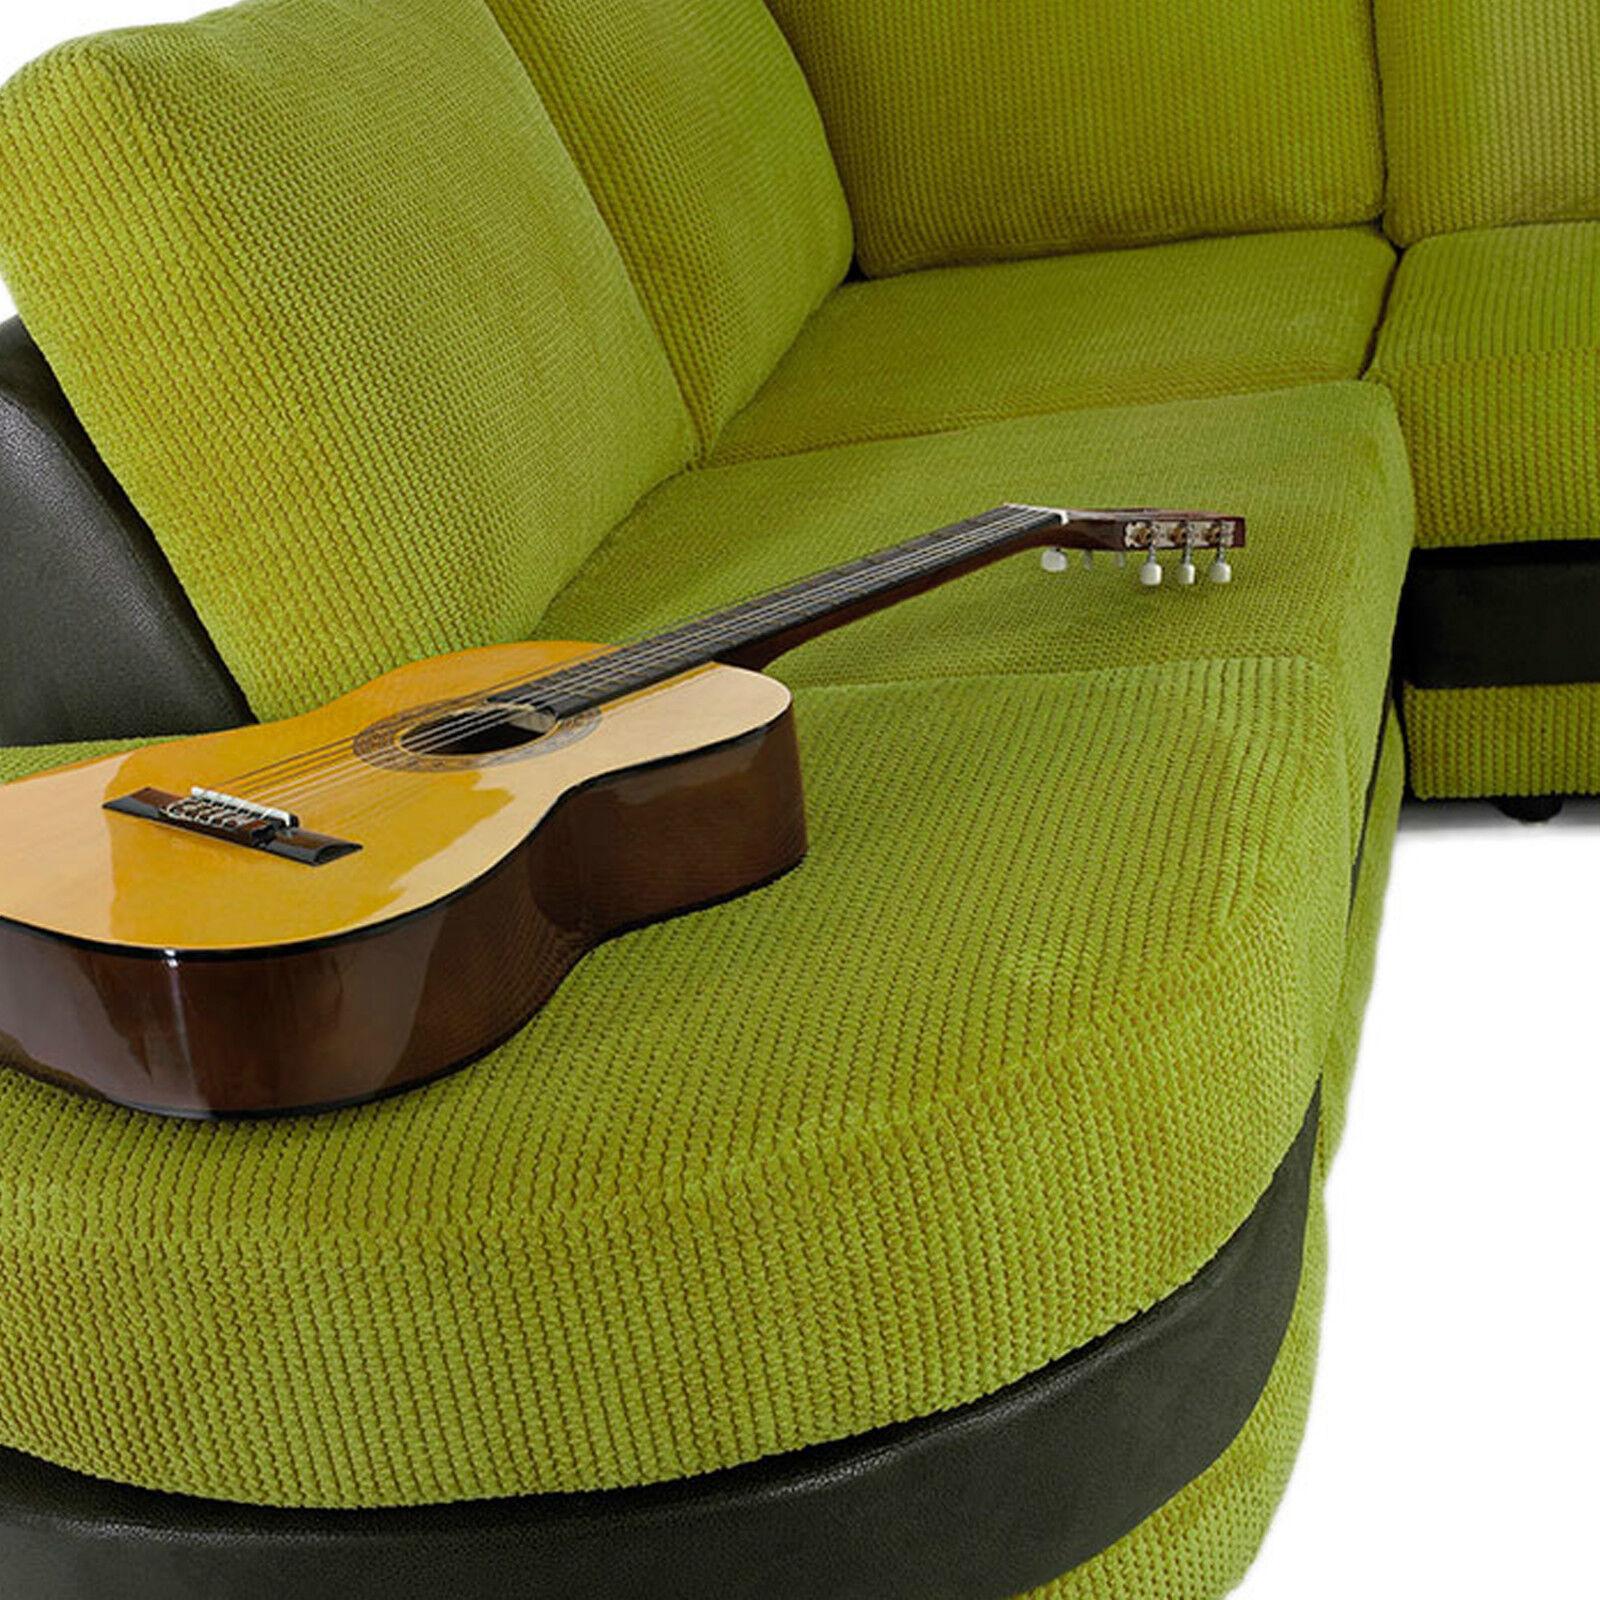 Soft Velvet Wave Ripple Cord Upholstery Sofa Cushion